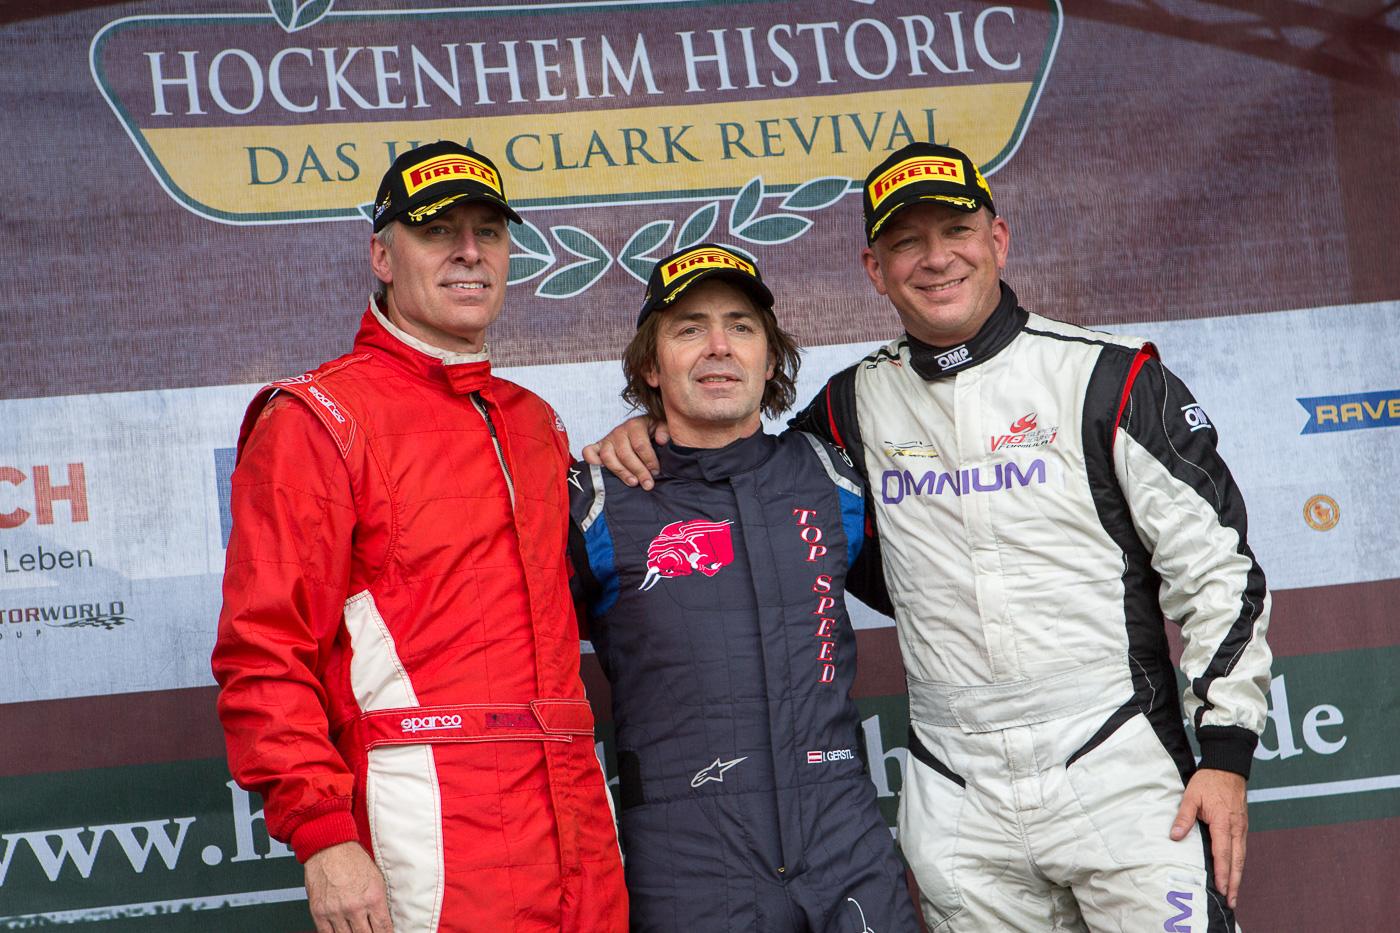 Podium of race 2 of the OPEN class in Hockenheim.